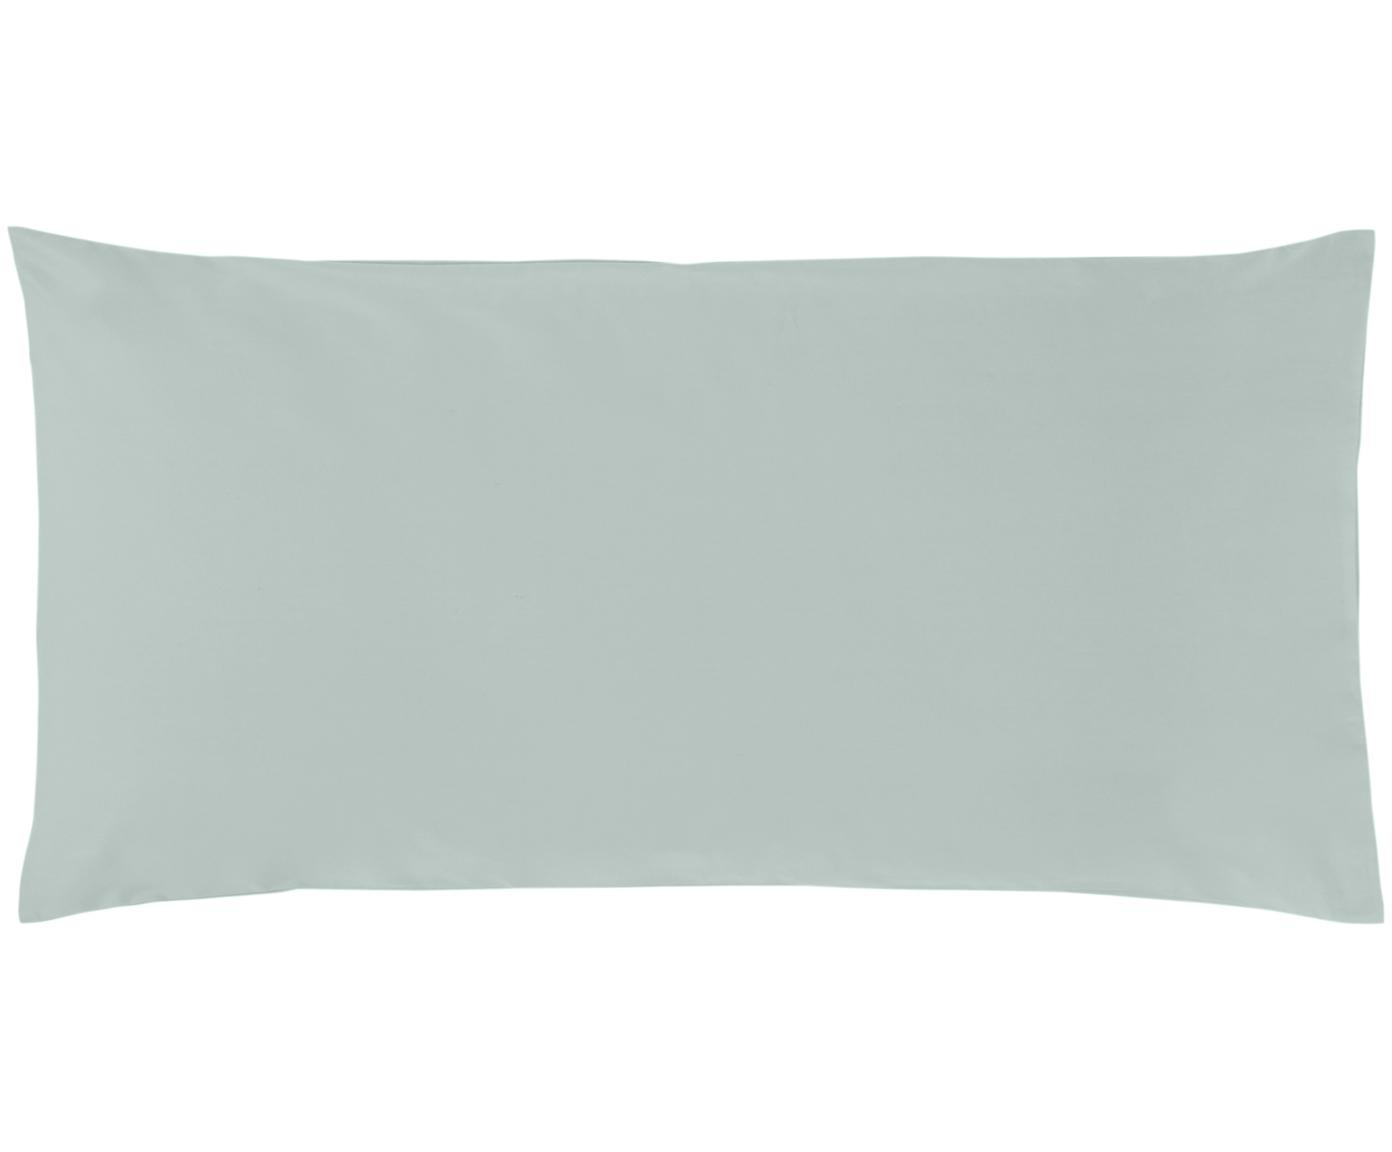 Baumwollperkal-Kissenbezüge Elsie in Salbeigrün, 2 Stück, Webart: Perkal Fadendichte 200 TC, Salbeigrün, 40 x 80 cm